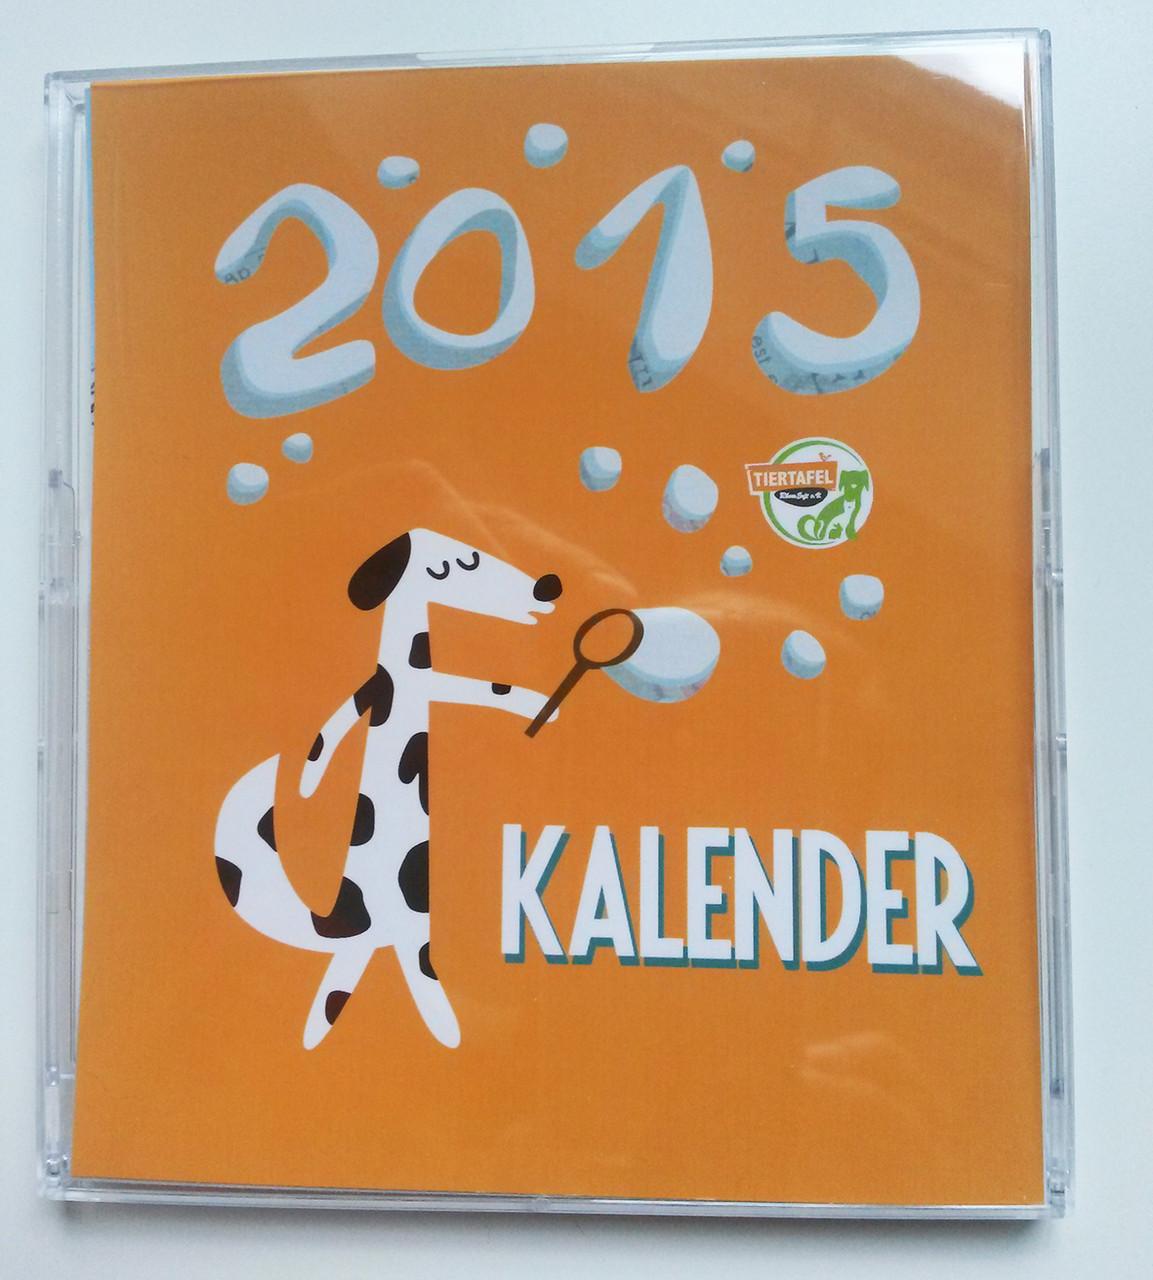 Kalender im CD Format